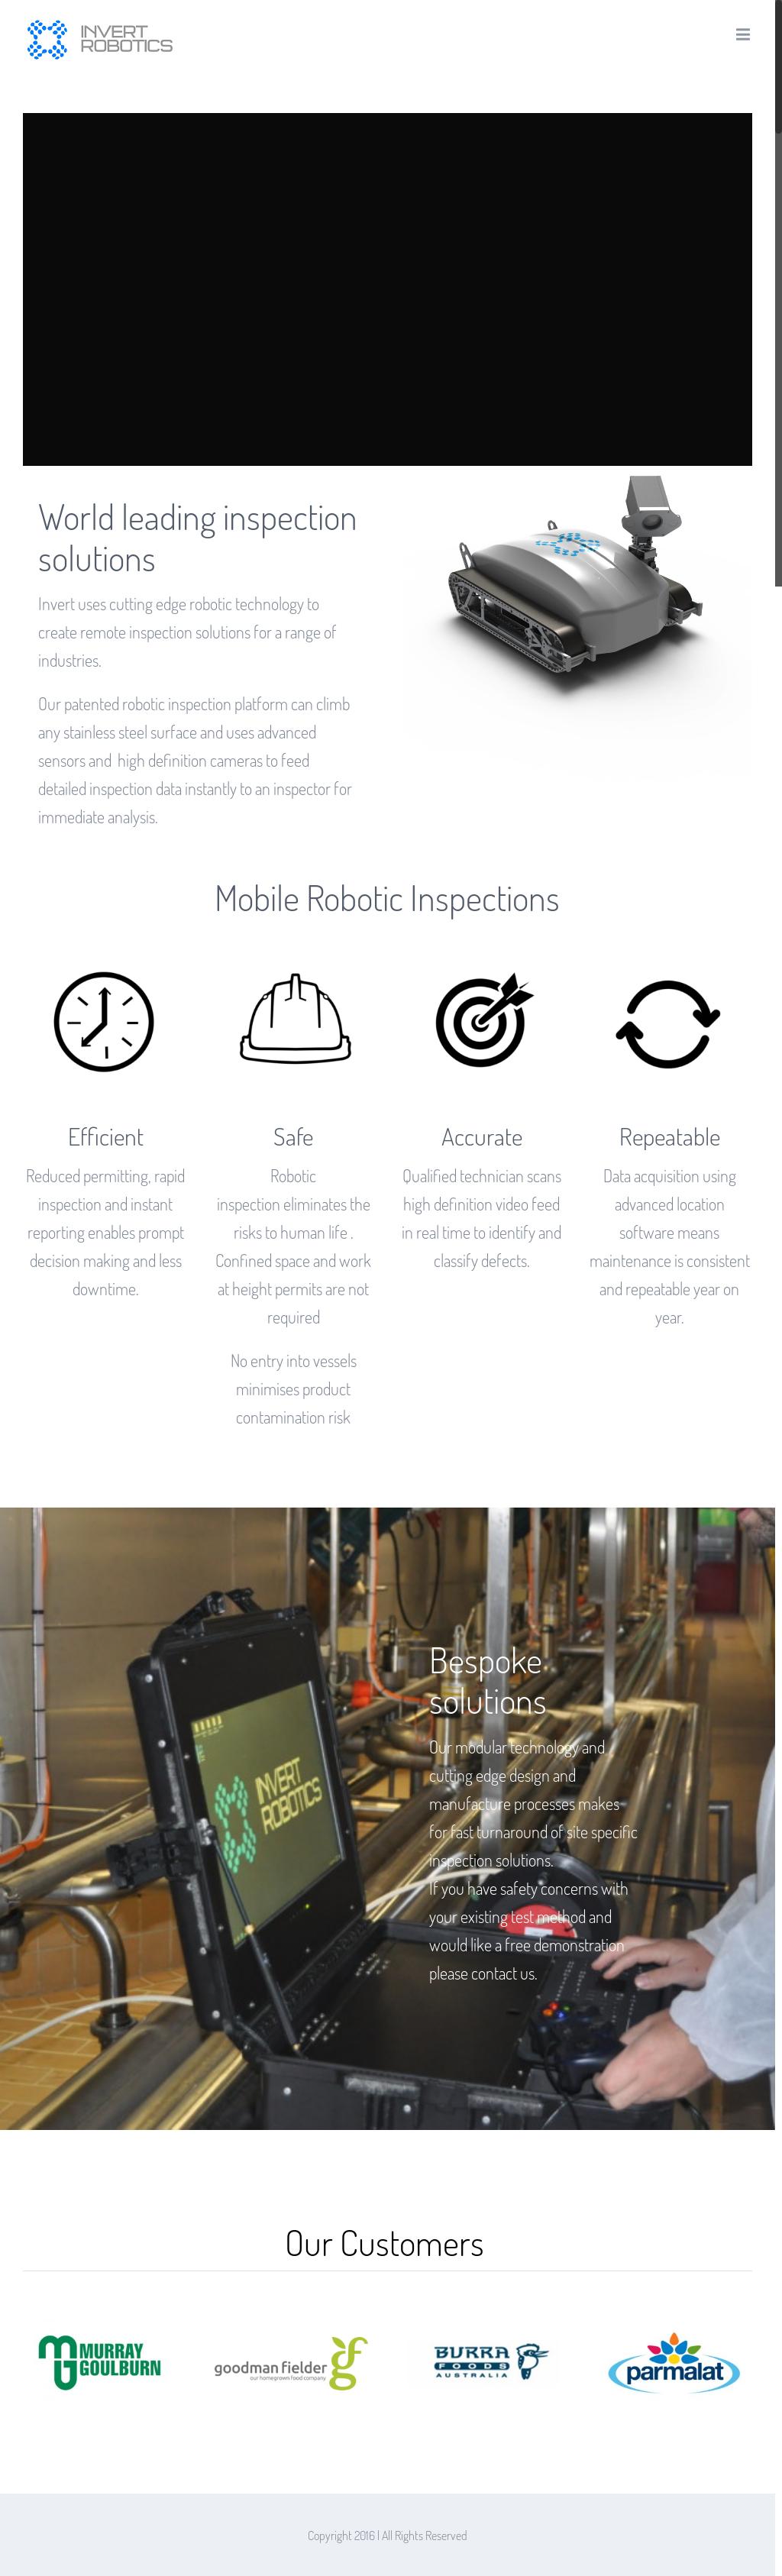 Invert Robotics Competitors, Revenue and Employees - Owler